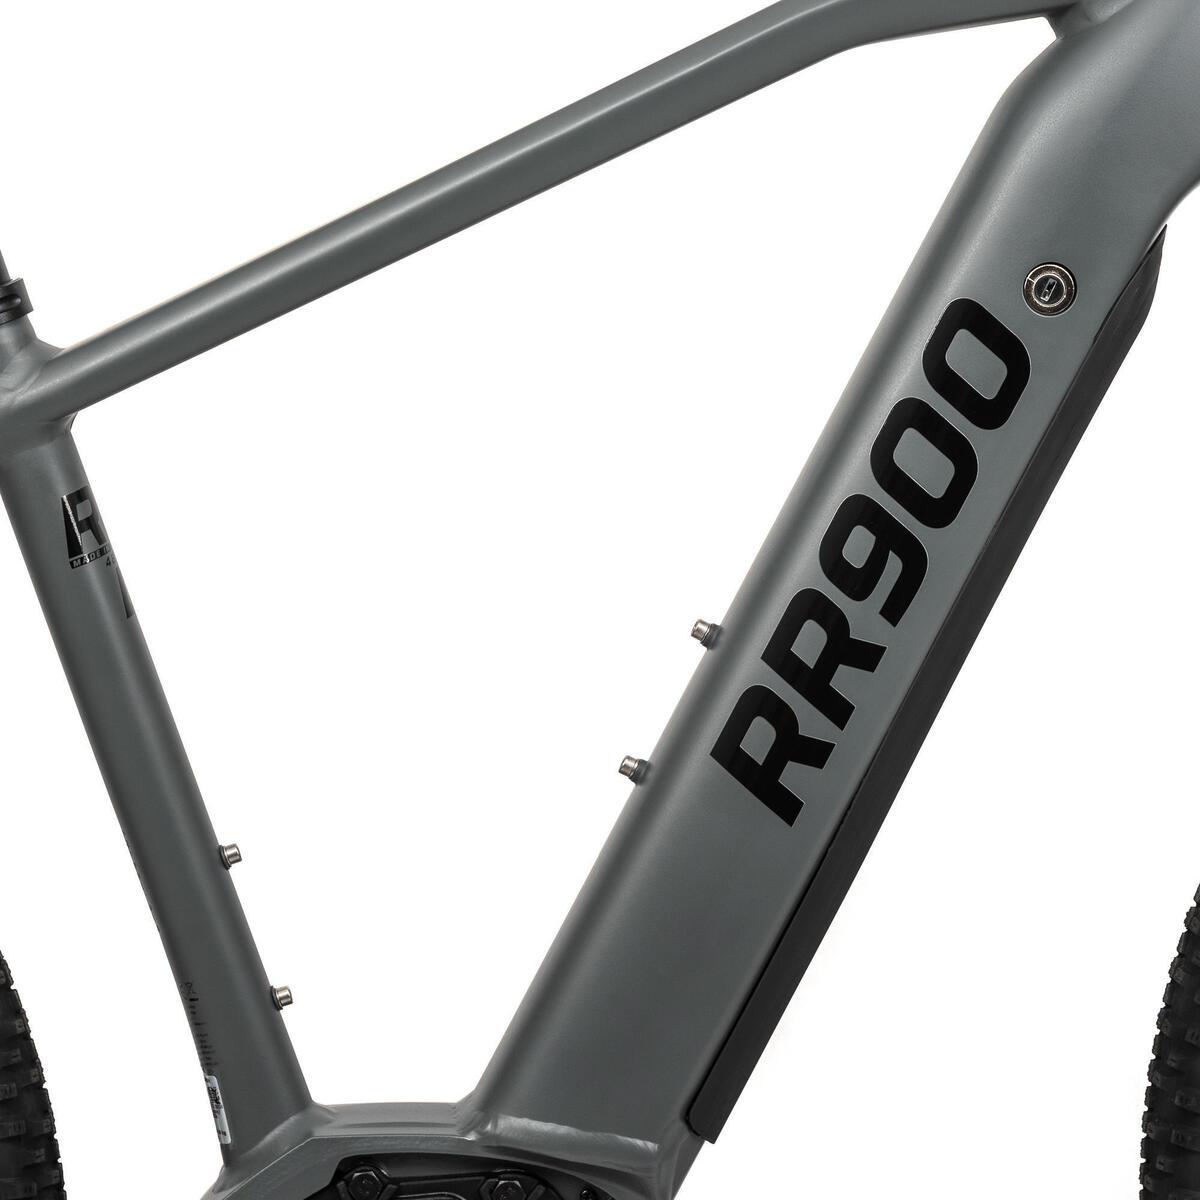 Bild 2 von E-Mountainbike 29 Zoll RR 900 Performance CX 500 Wh